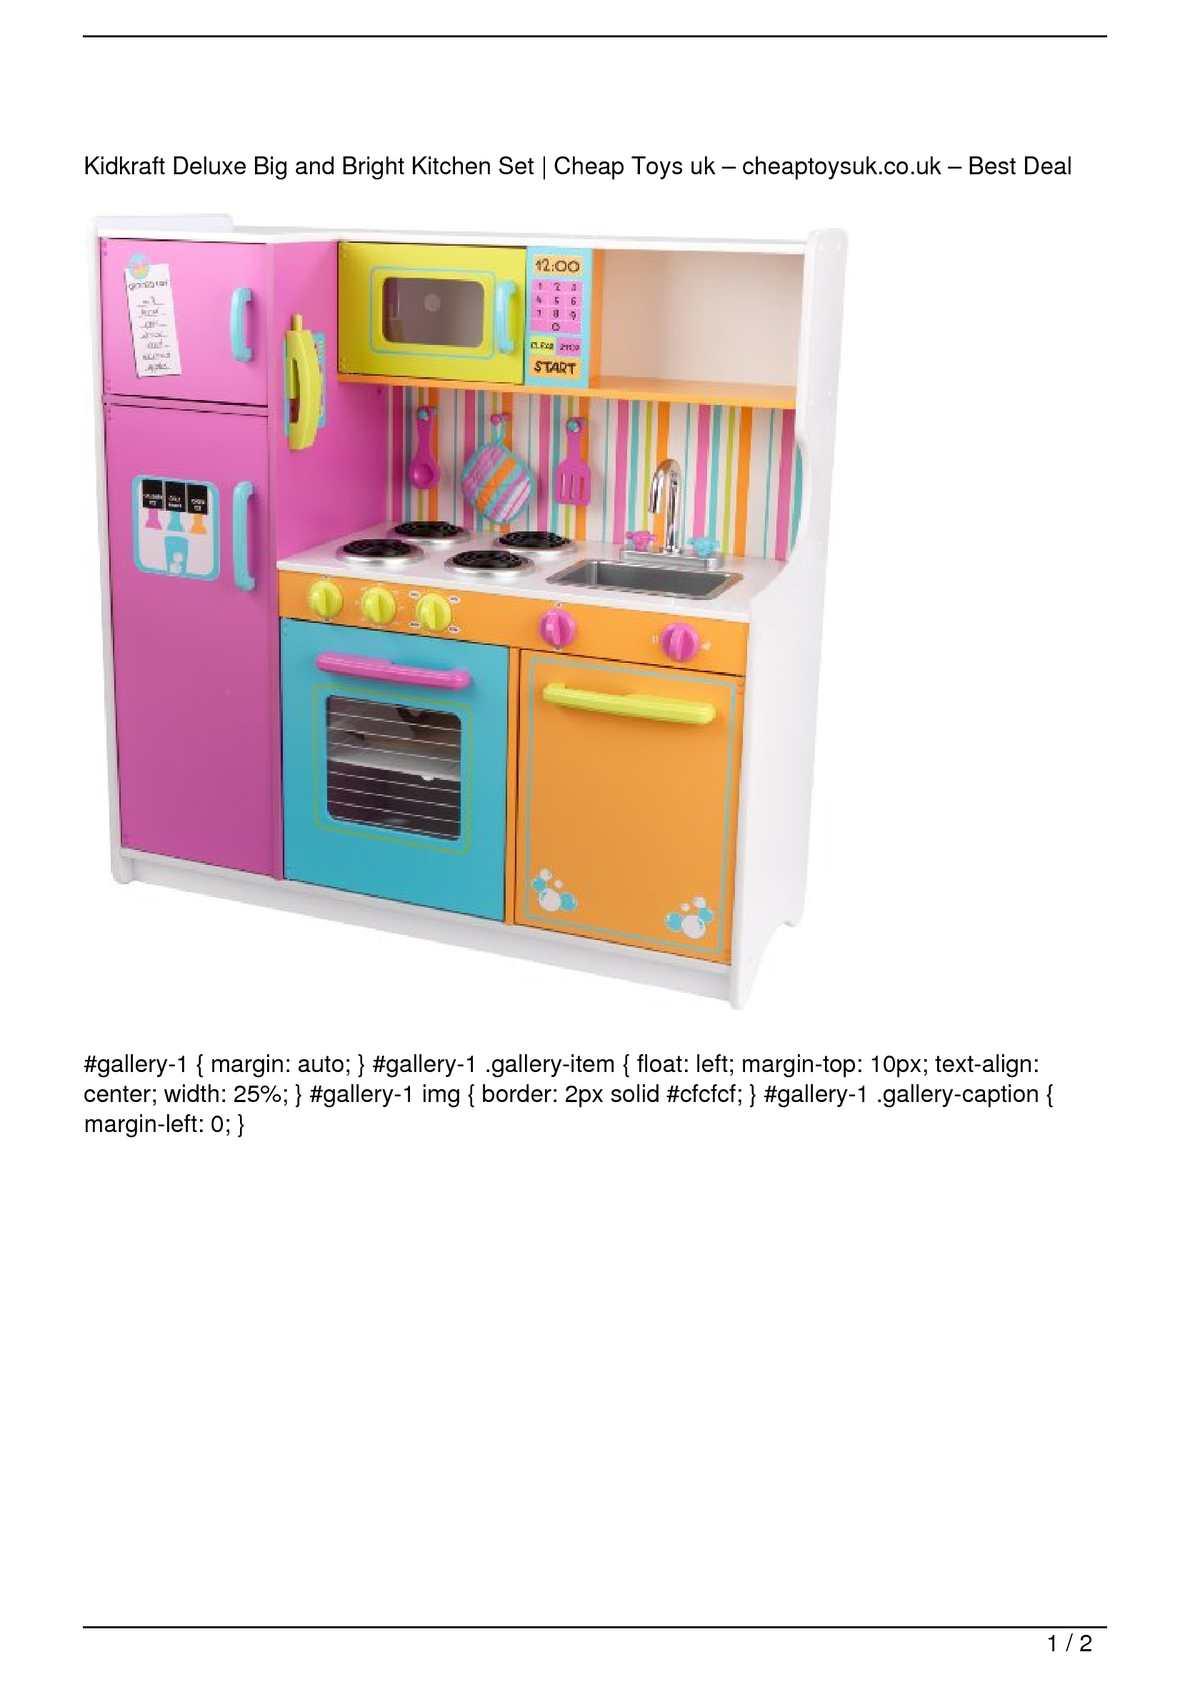 Calaméo - Kidkraft Deluxe Big and Bright Kitchen Set Big SALE